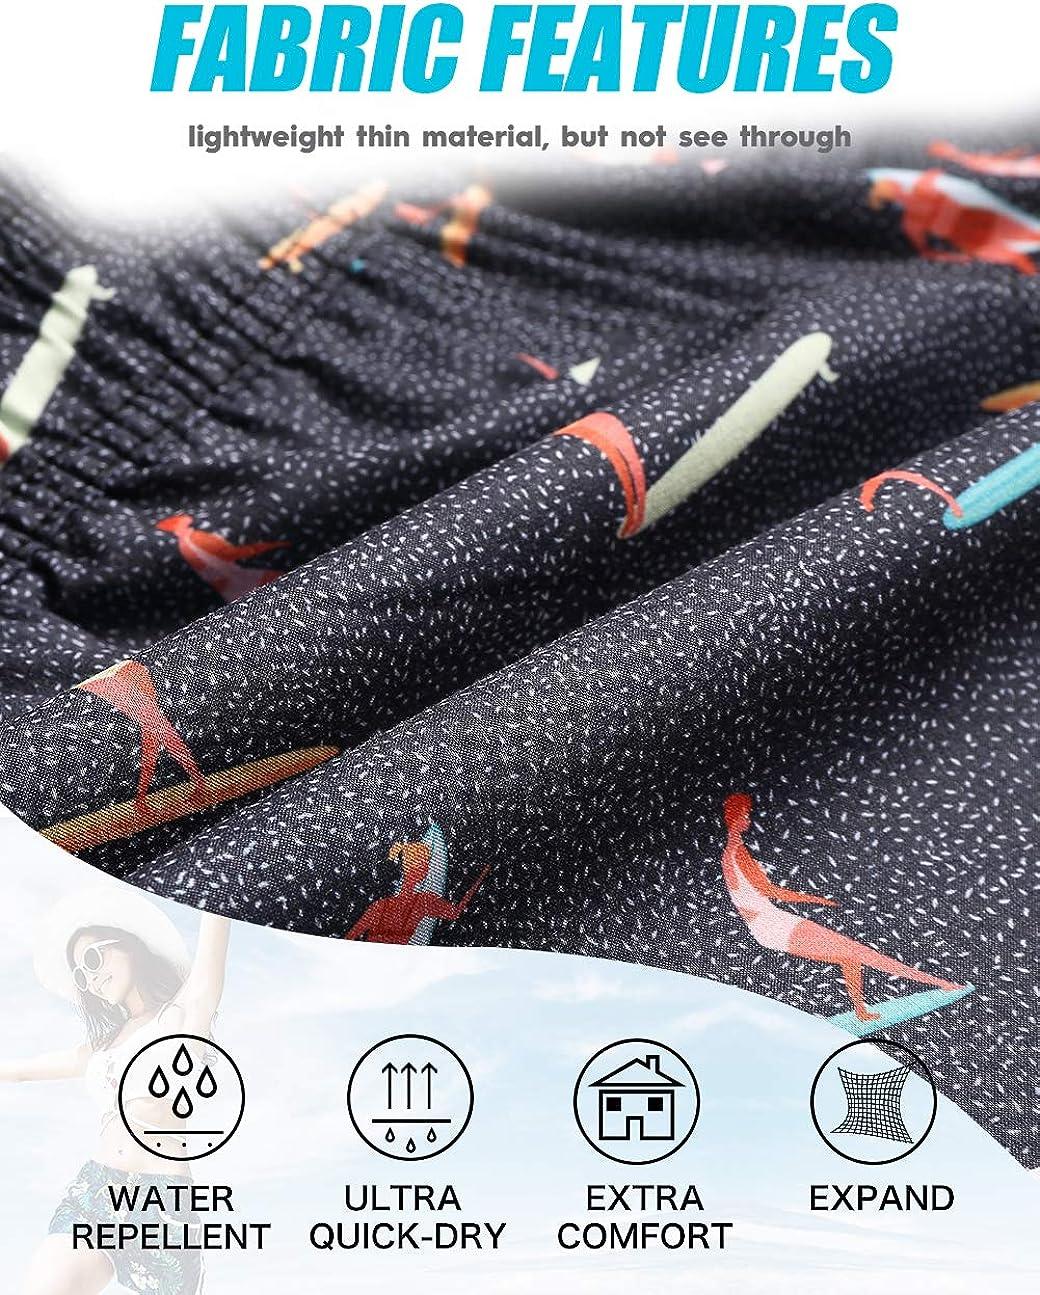 Womens Swim Shorts Elastic High Waist Retro Floral Board Shorts Swimwear Quick Dry Printed Beach Wear with Pockets